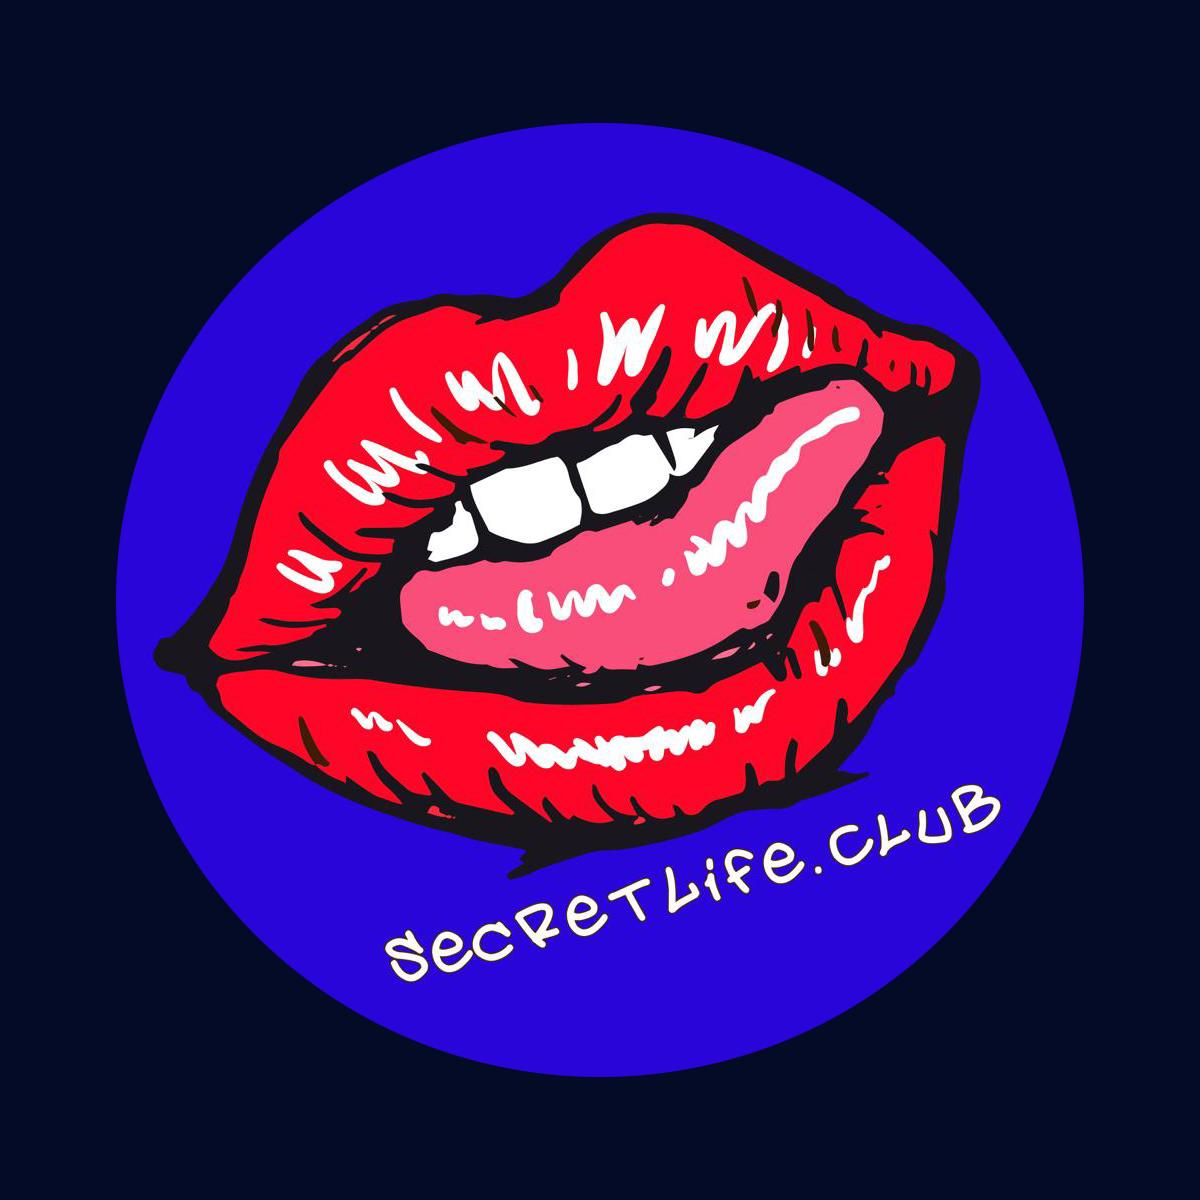 Secret Life Club